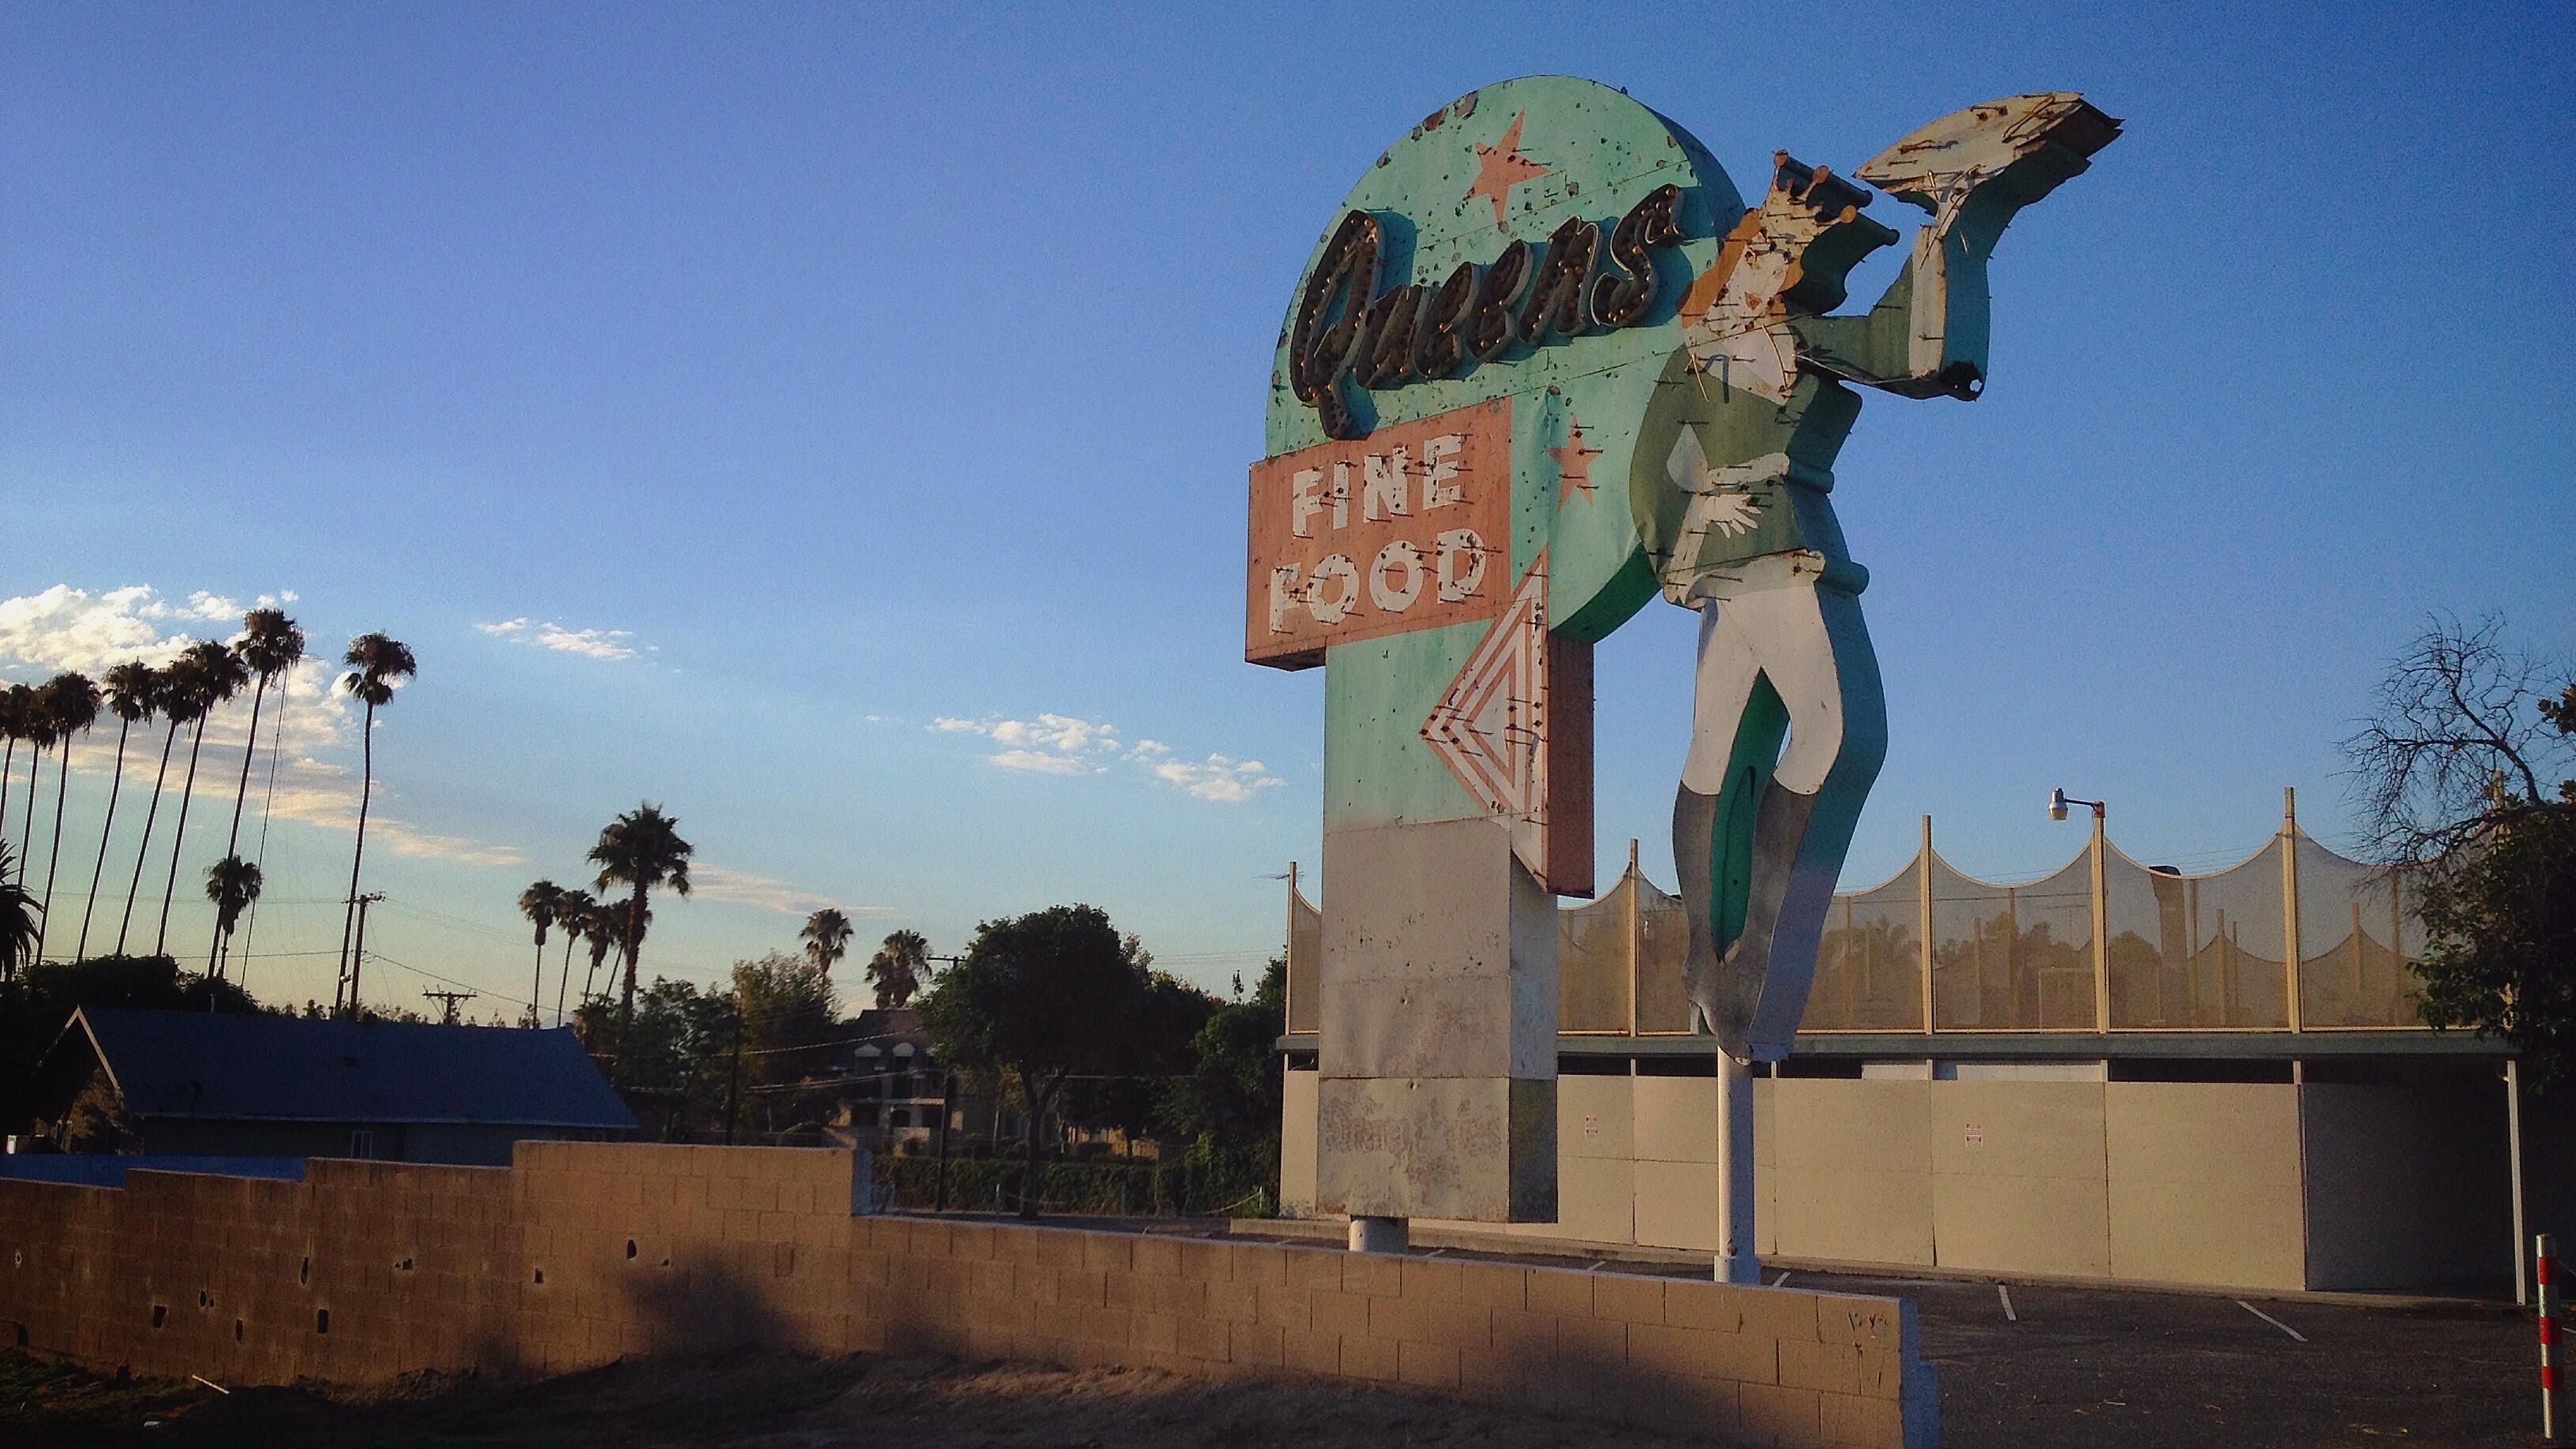 Queen's - 601 North Mountain View Avenue, San Bernardino, California U.S.A. - July 13, 2014